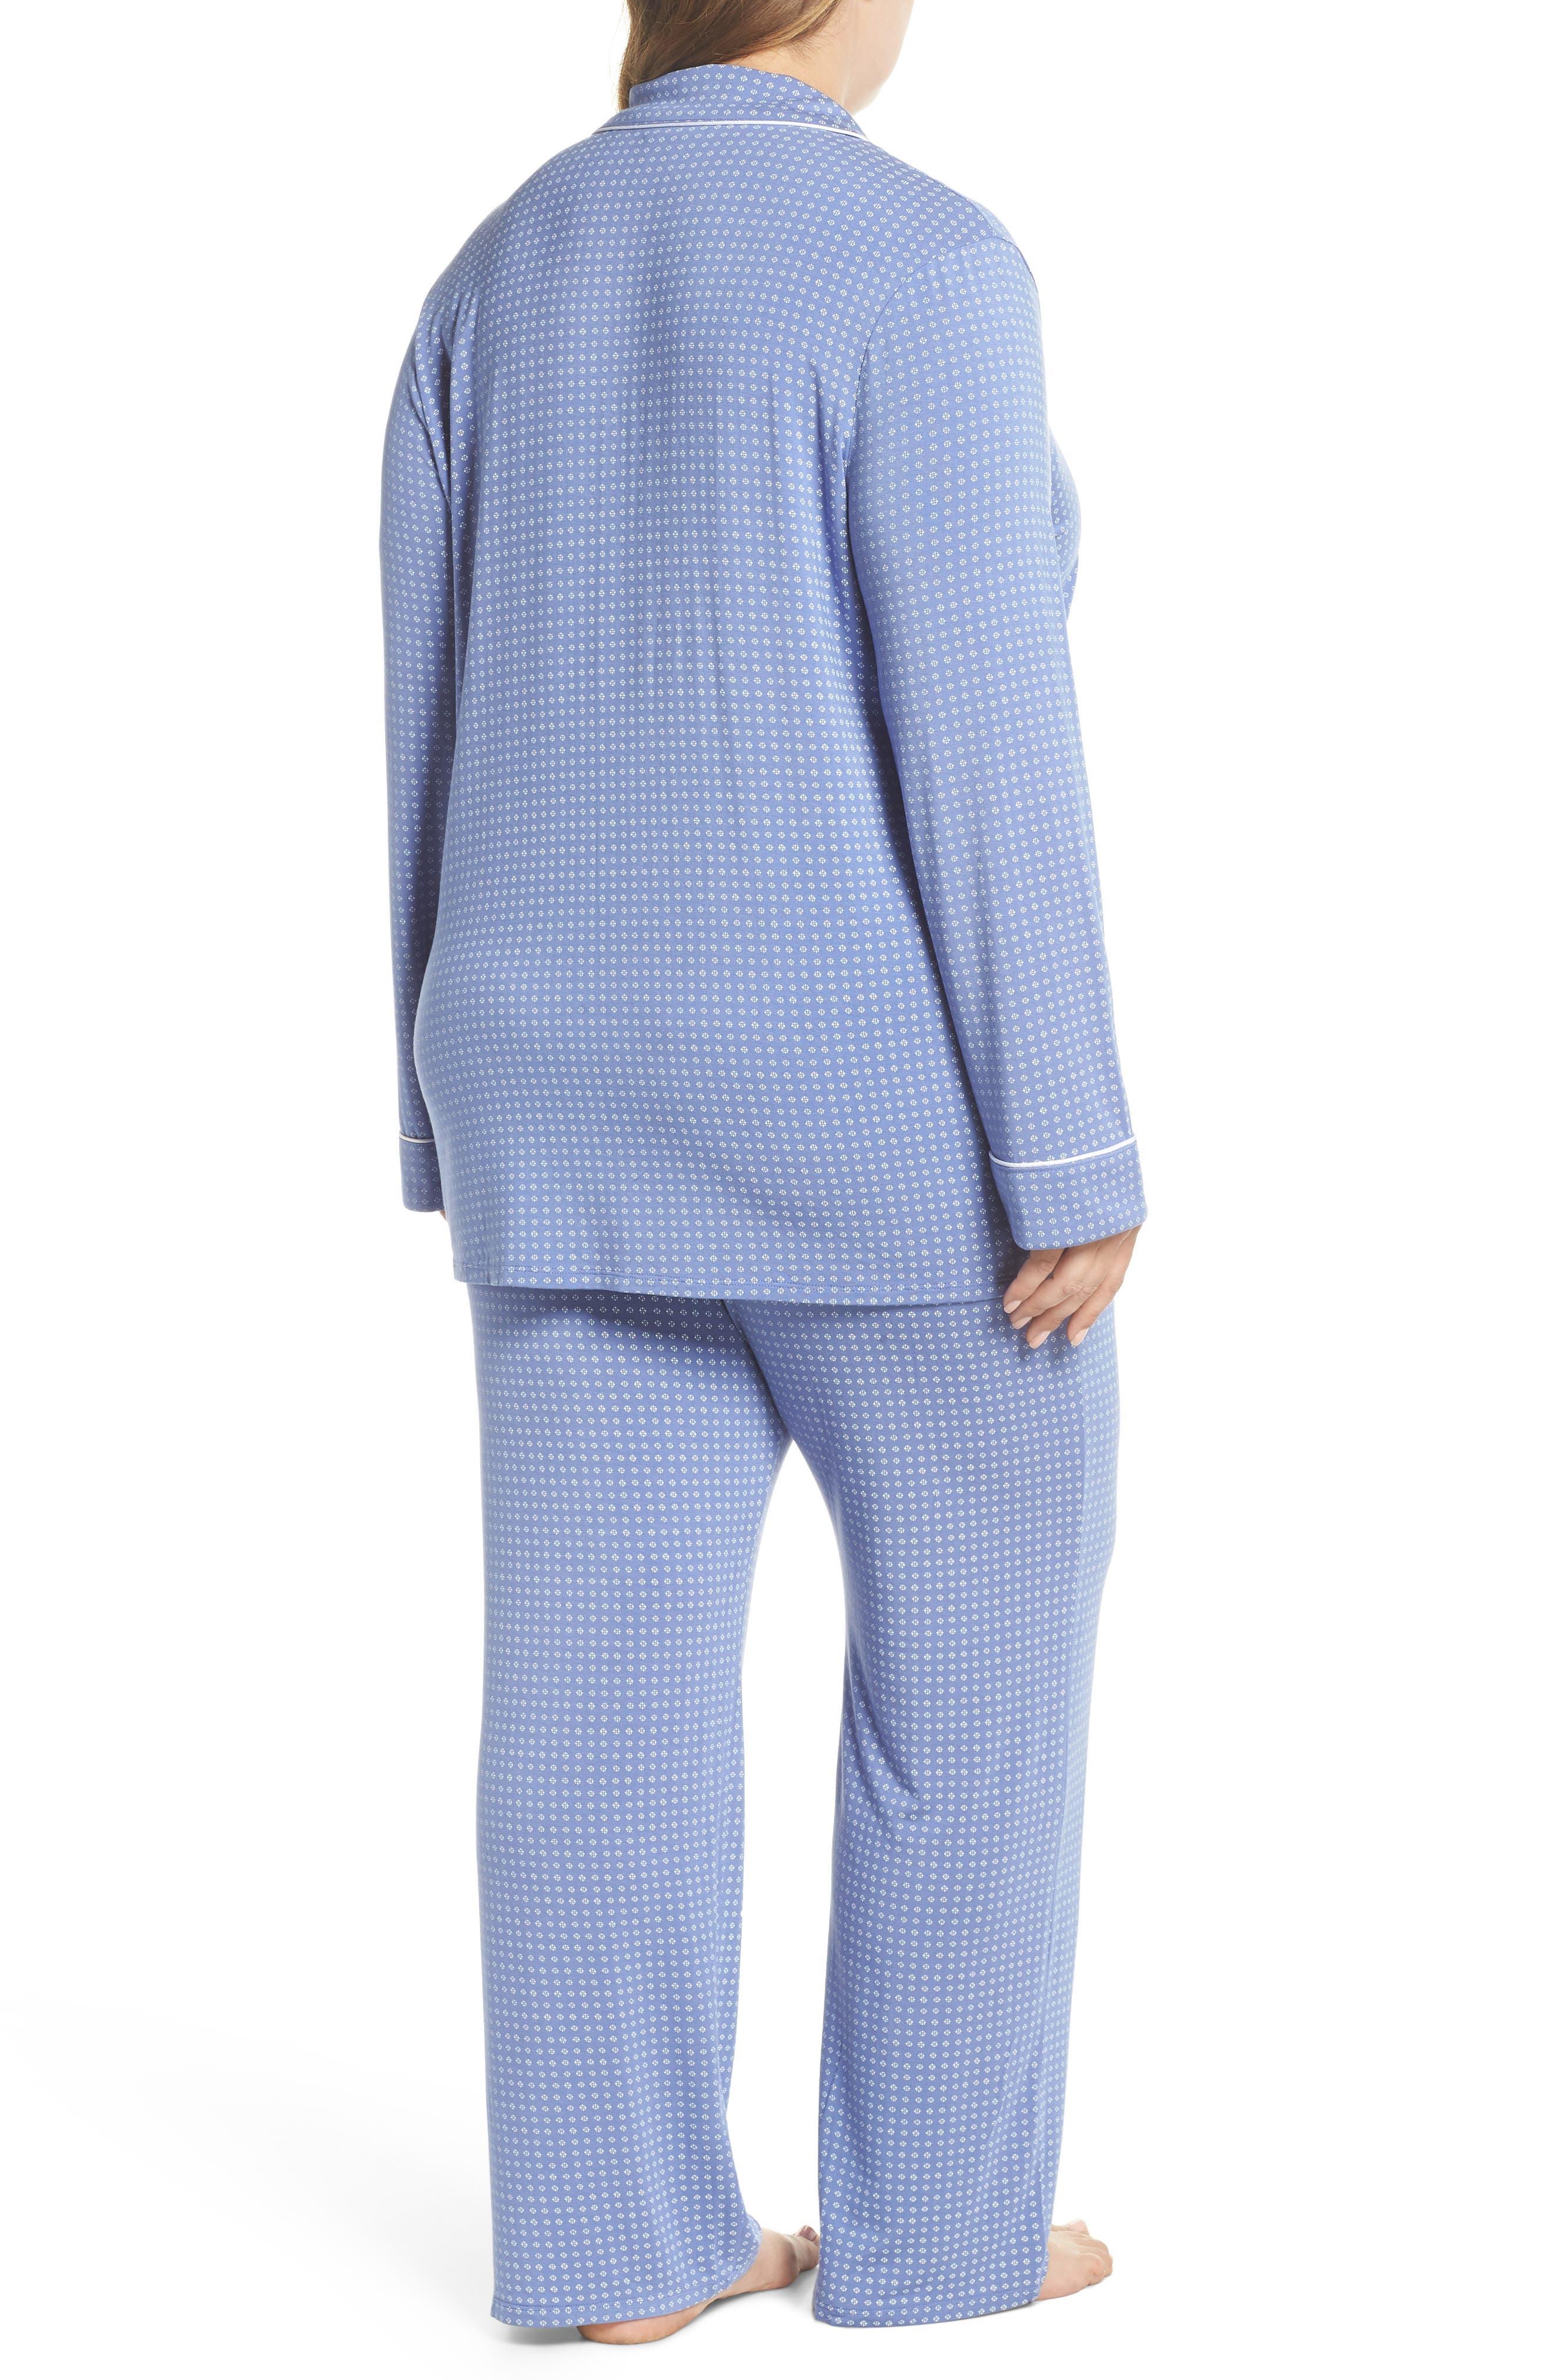 'Moonlight' Pajamas,                             Alternate thumbnail 2, color,                             Blue Denim Geo